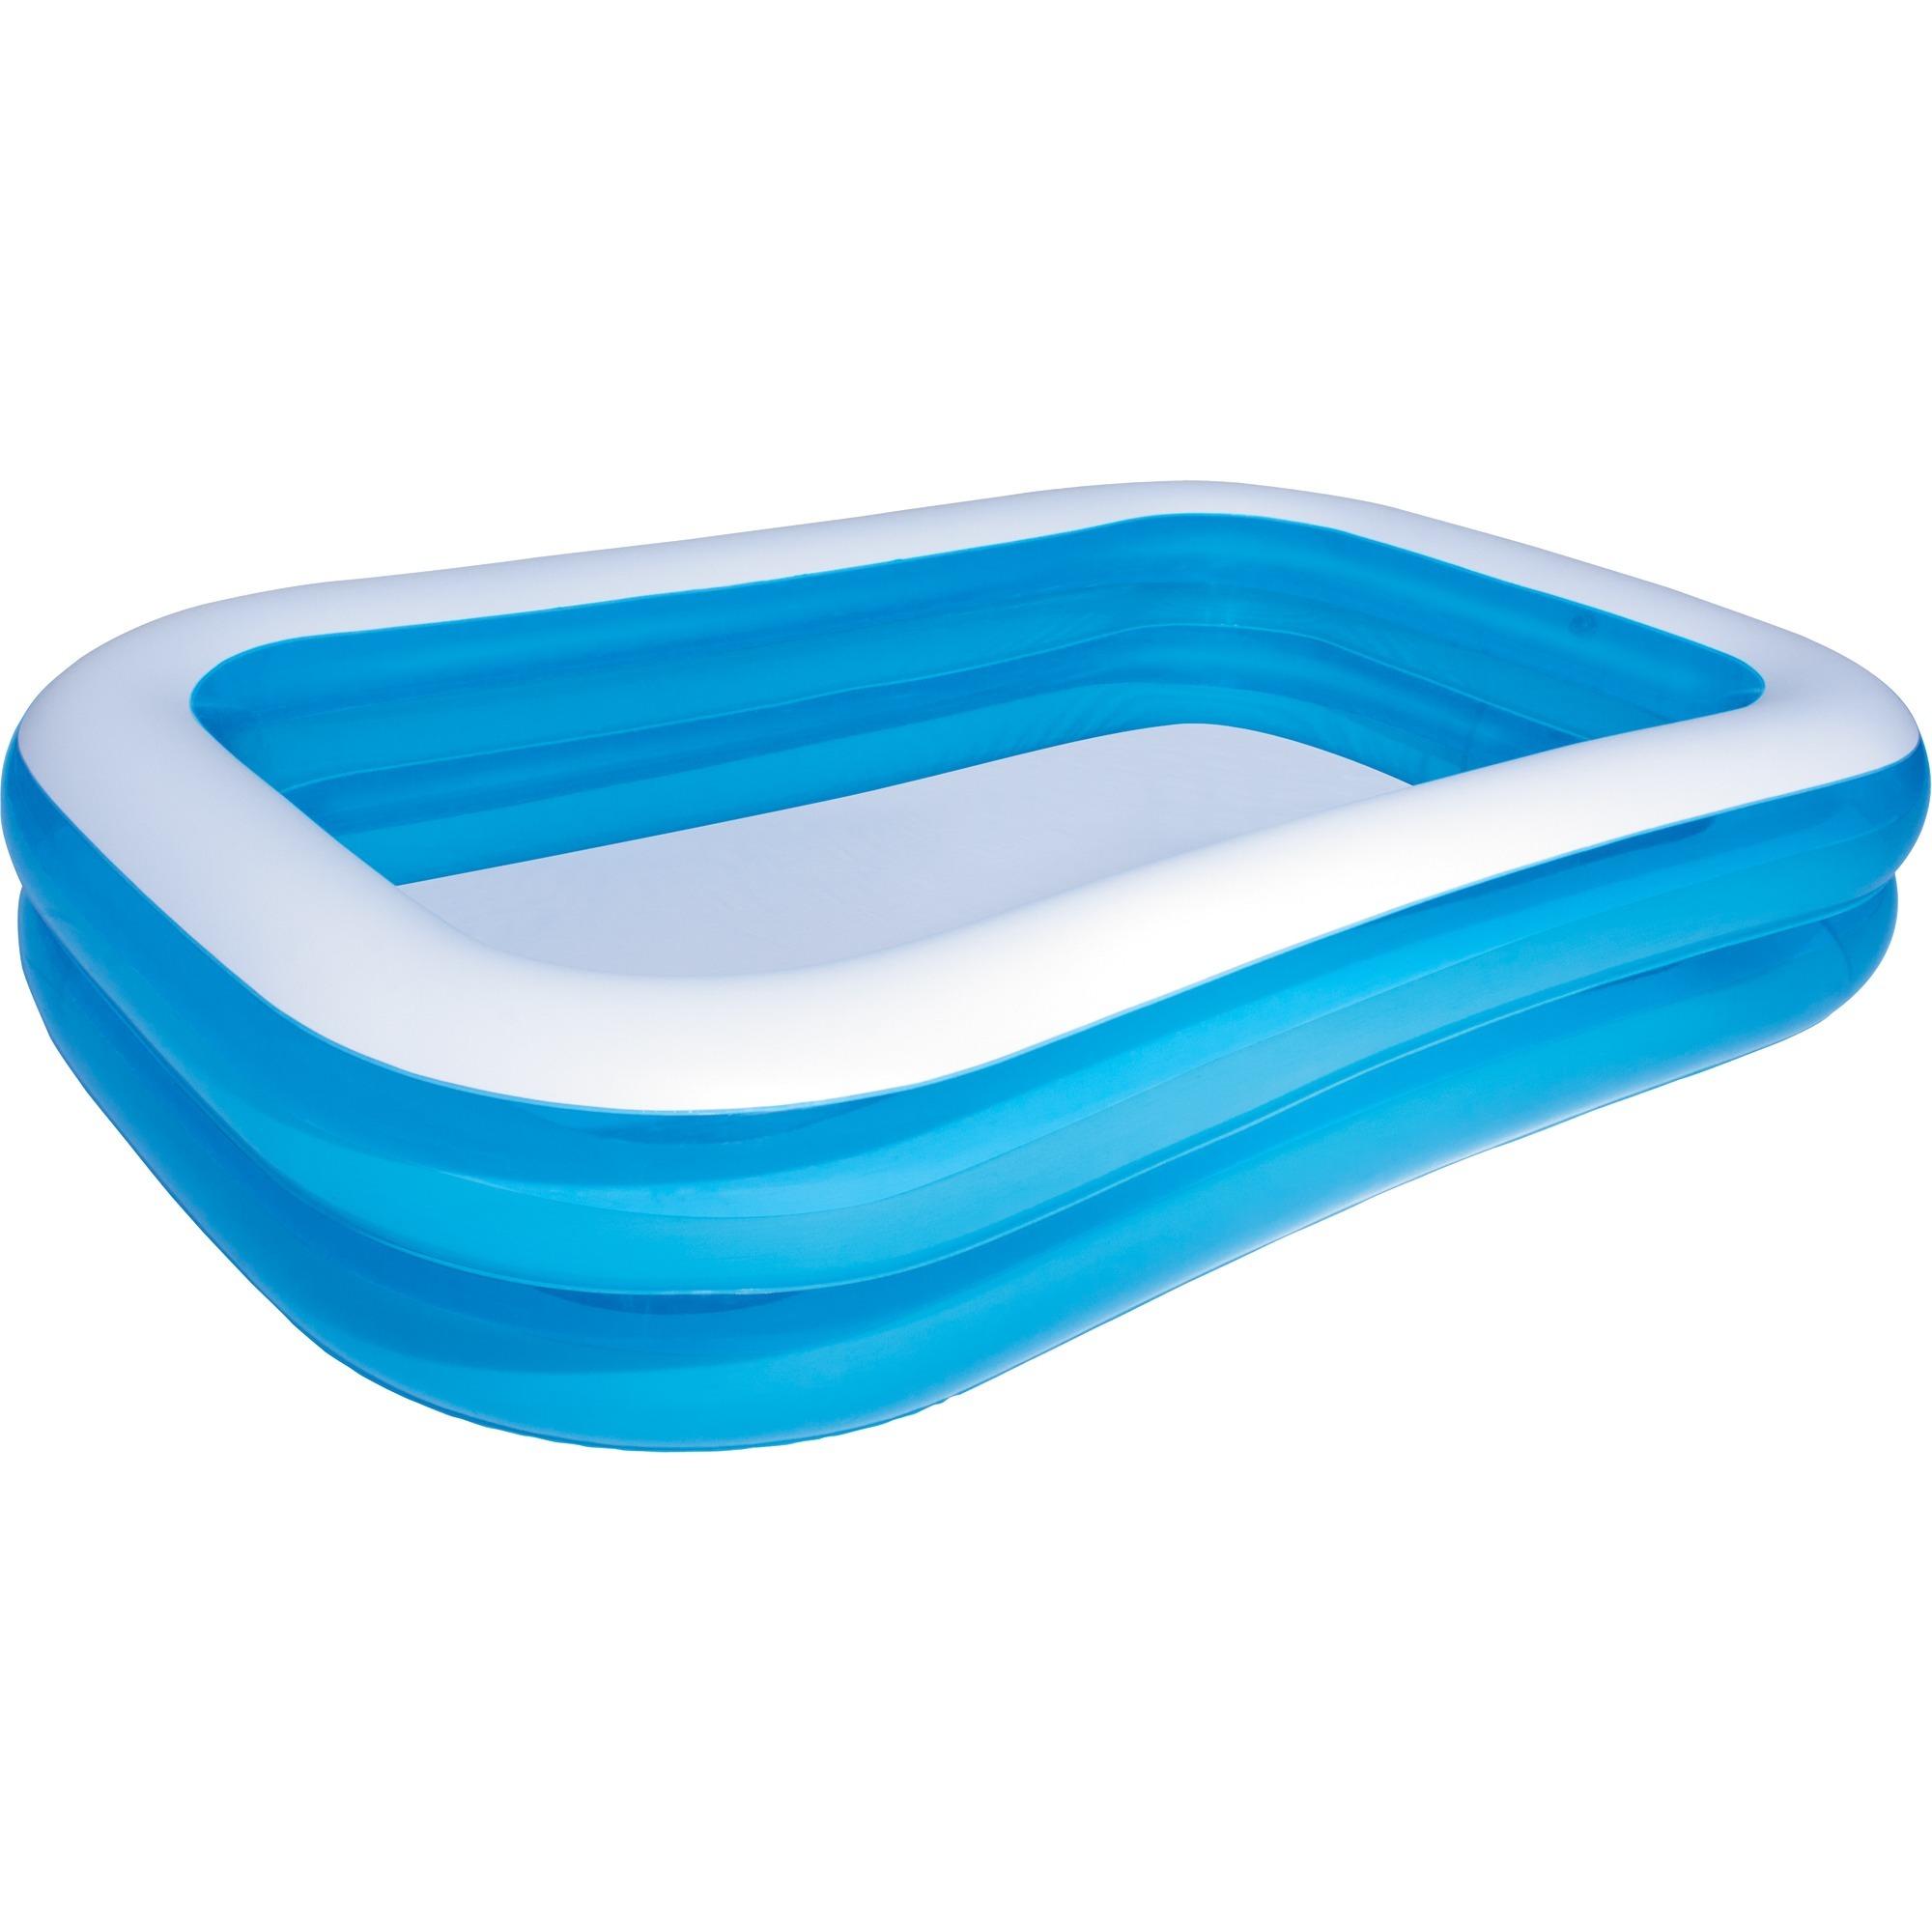 54006-450l-vinyl-legebassin-til-born-swimming-pool